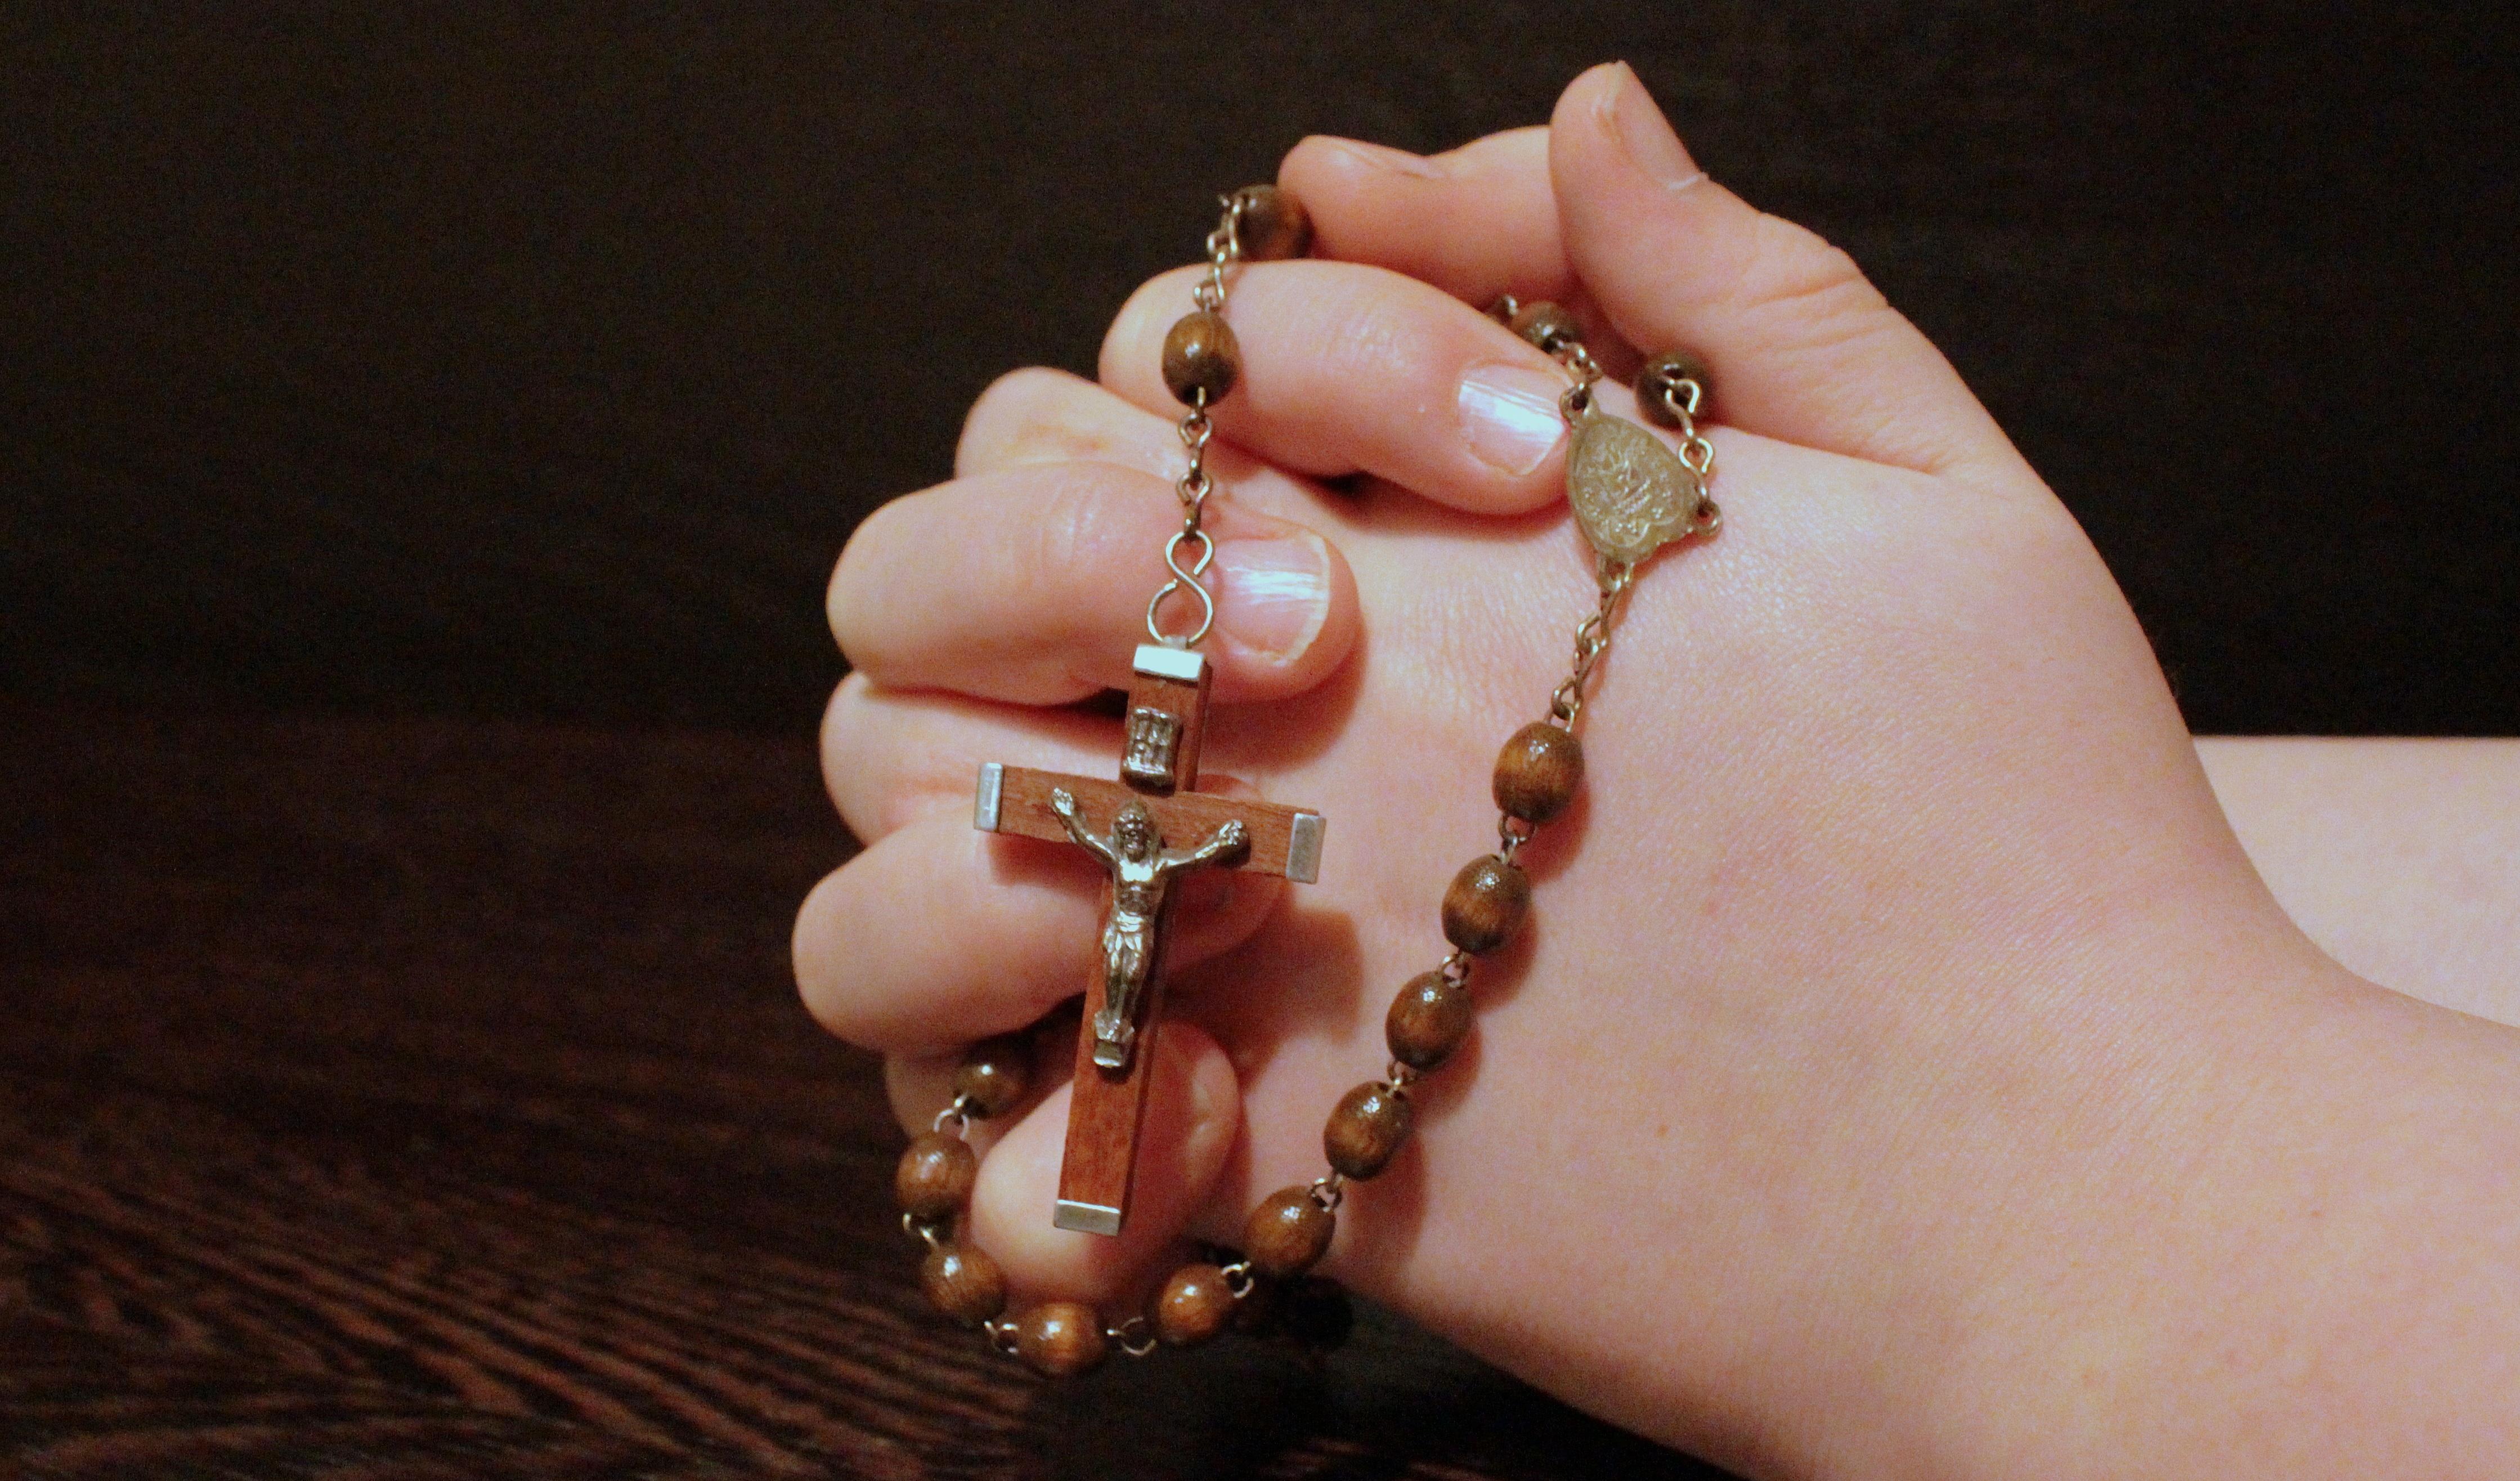 hands hand chain cross jesus rosary finger human god pray christian jewellery prayer necklace religion pink ear folded faith organ